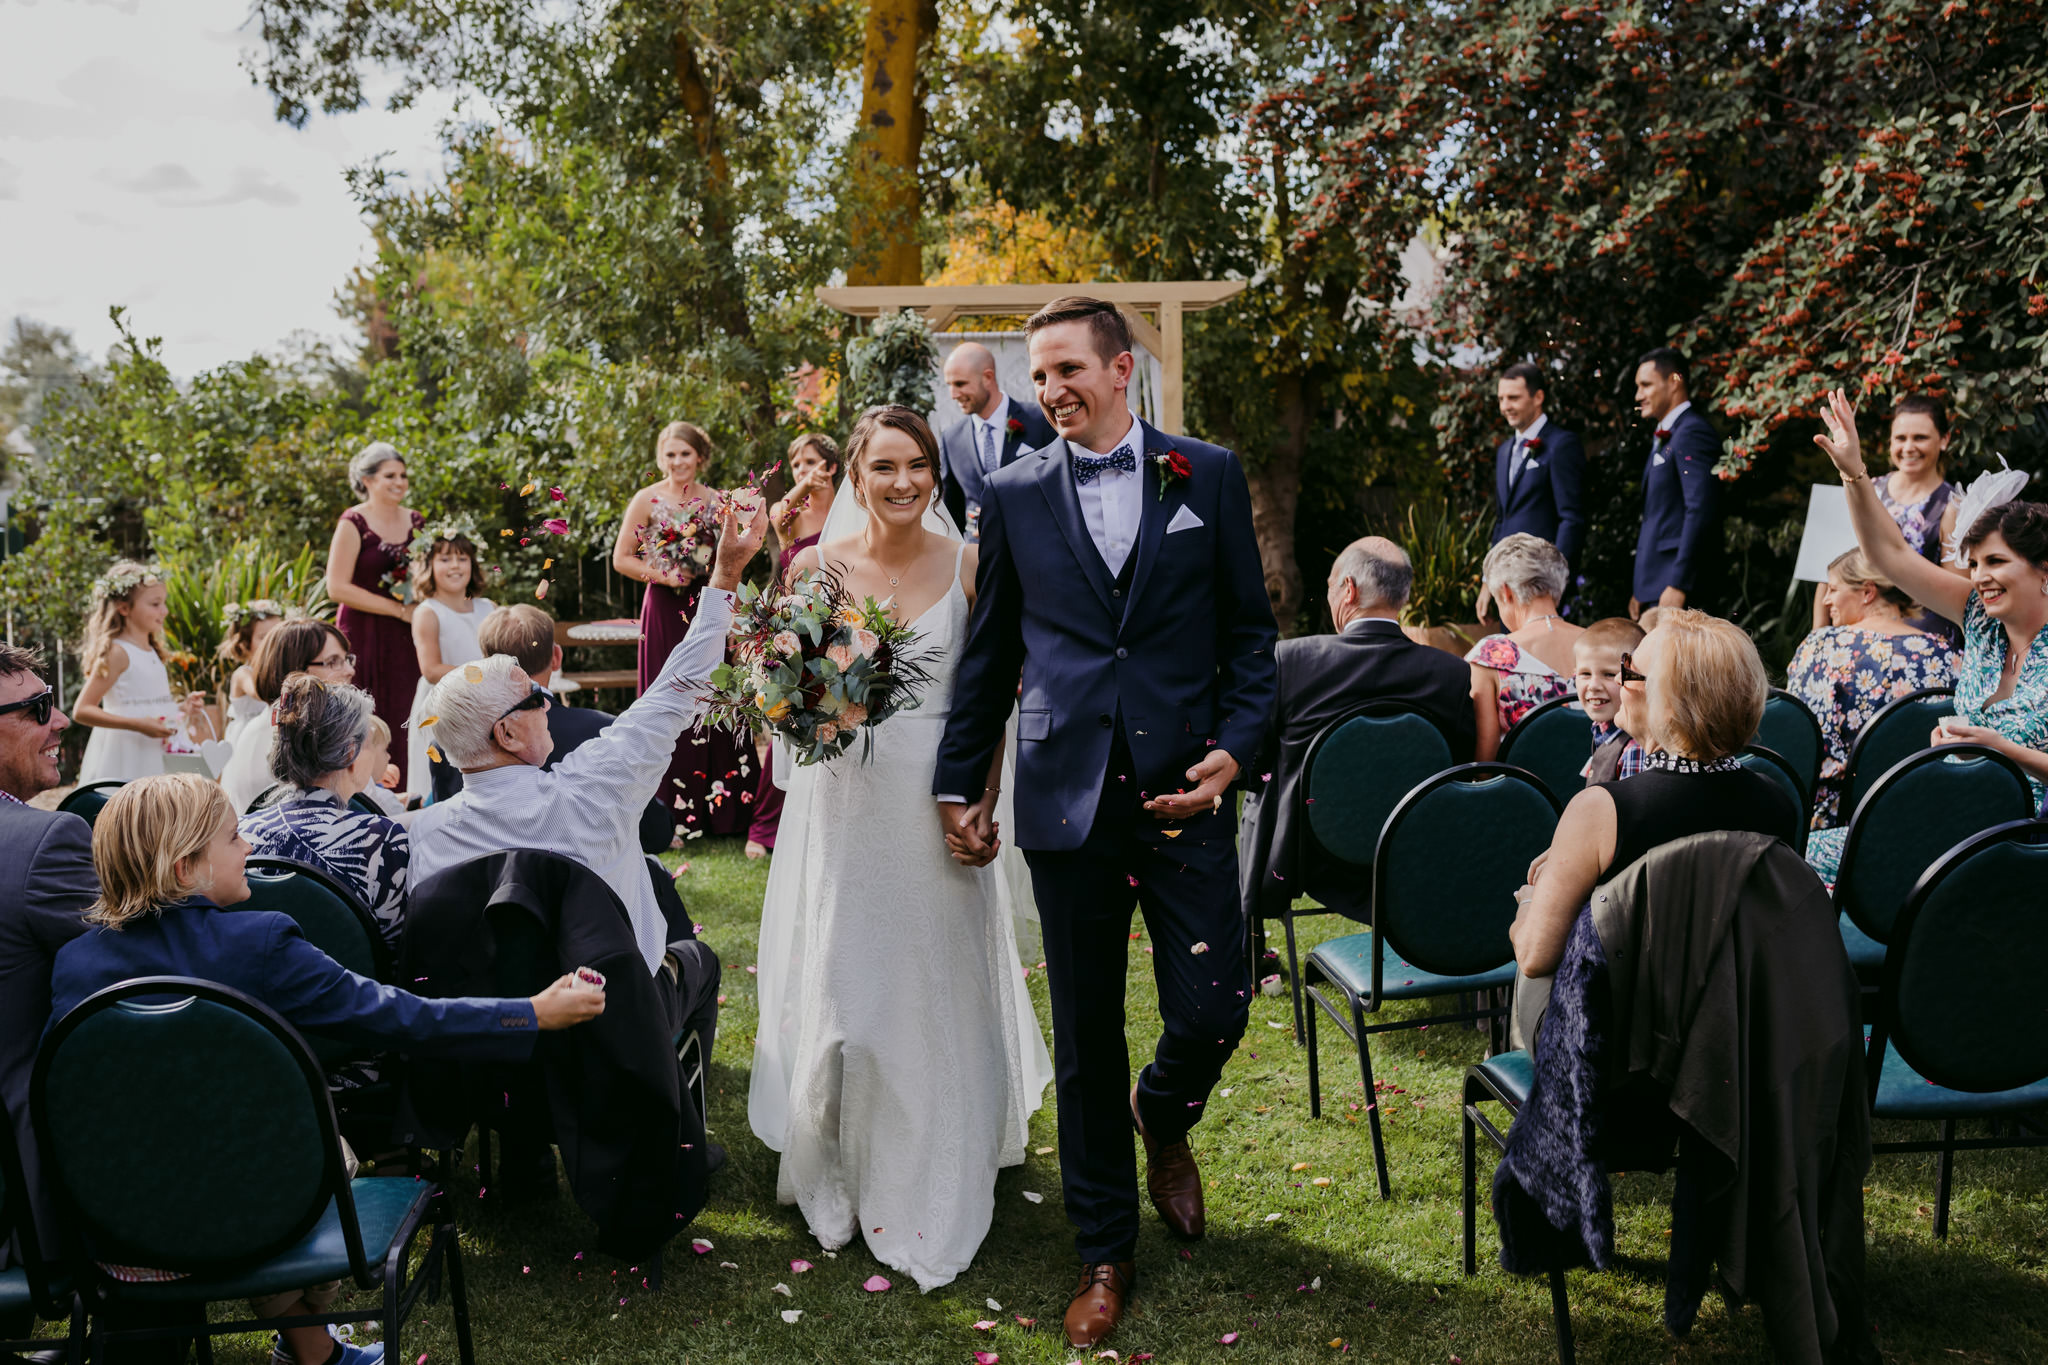 Erin Latimore Mudgee Canberra Wedding Photographer ROSEBANK GUESTHOUSE OLD THEATRE TONIC MILLTHORPE_301.JPG